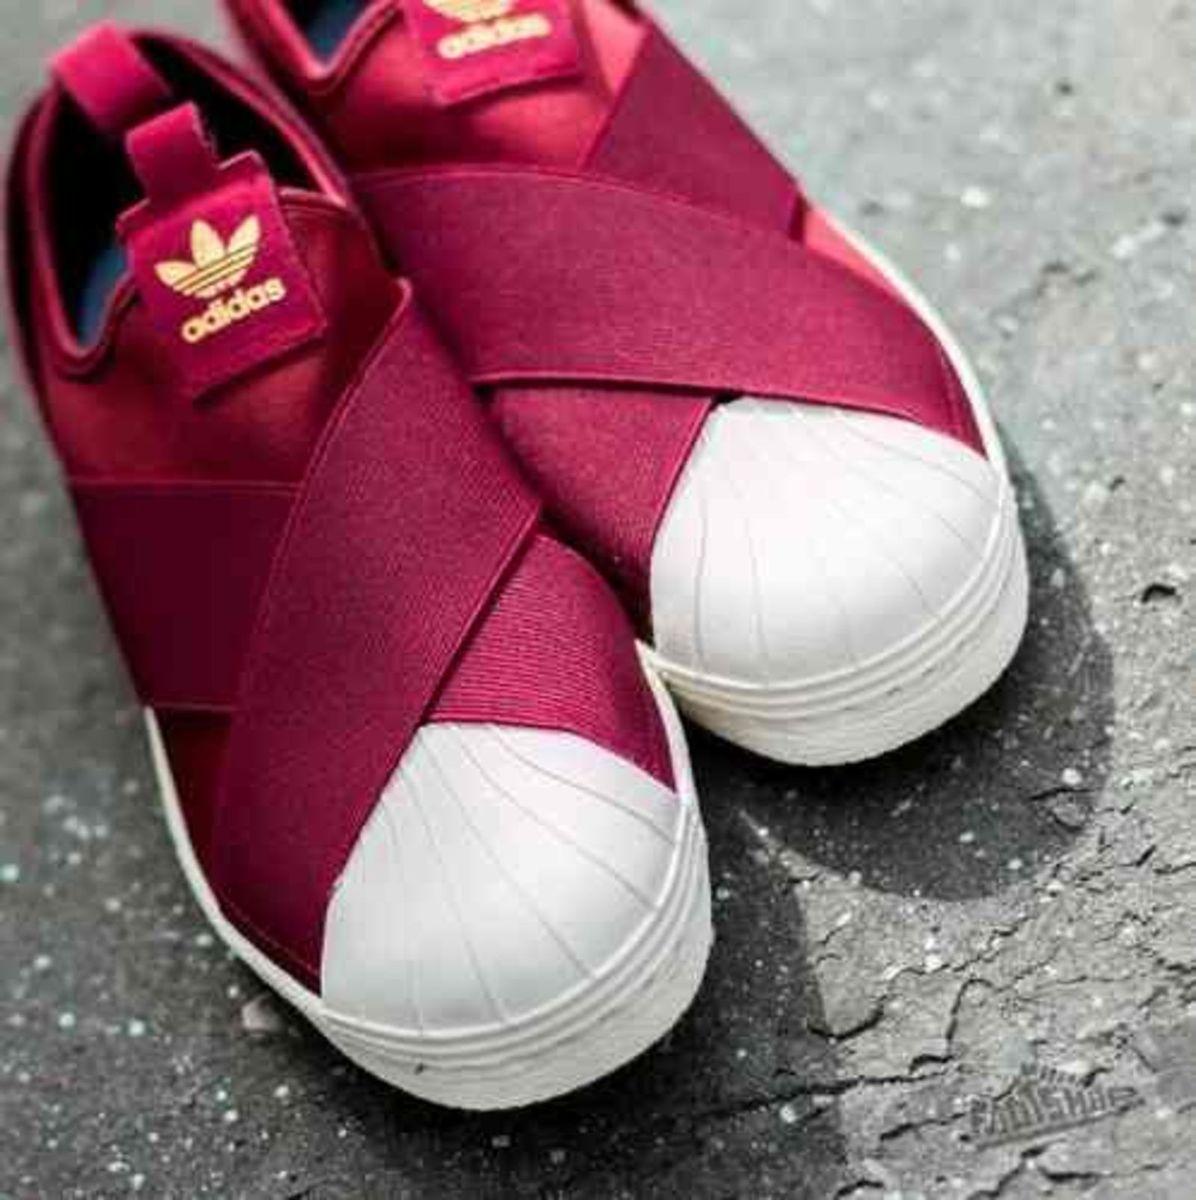 seguro calcetines Colectivo  Tênis Elastico Adidas Superstar Slip On Vermelho 37   Tênis Feminino Adidas  Nunca Usado 25905874   enjoei